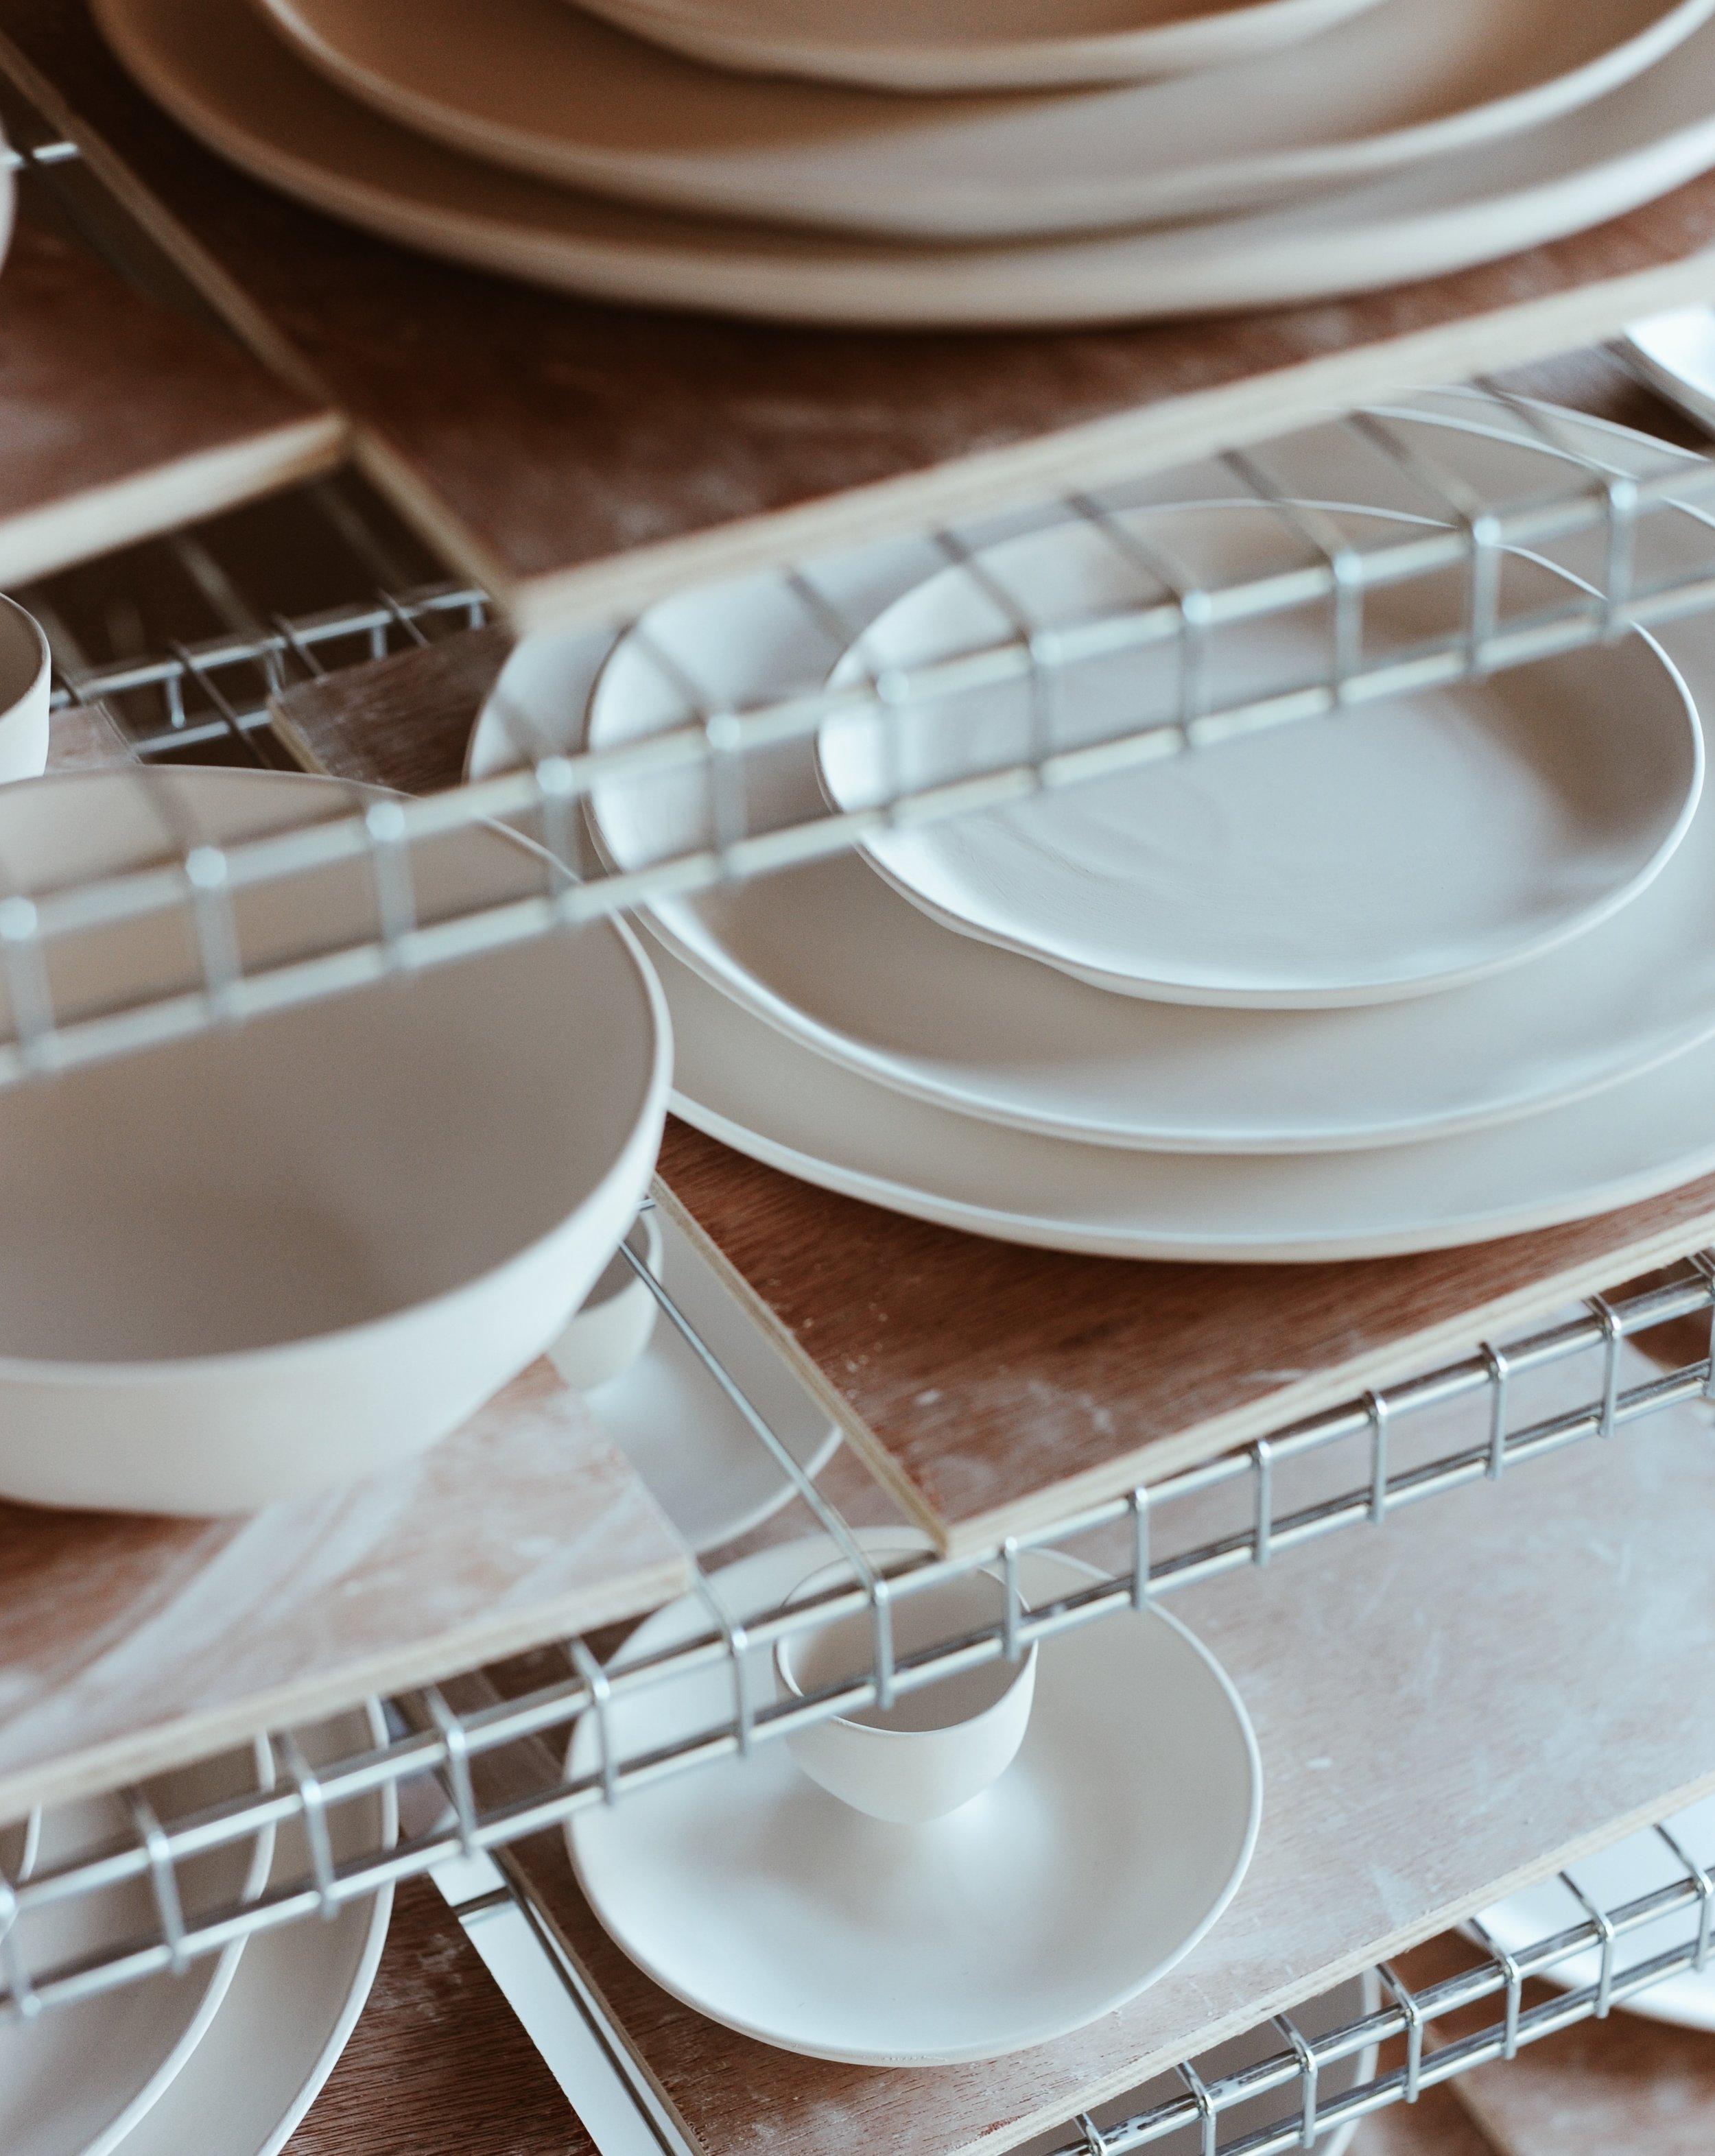 Feldspar fine bone china, bisqueware on shelves